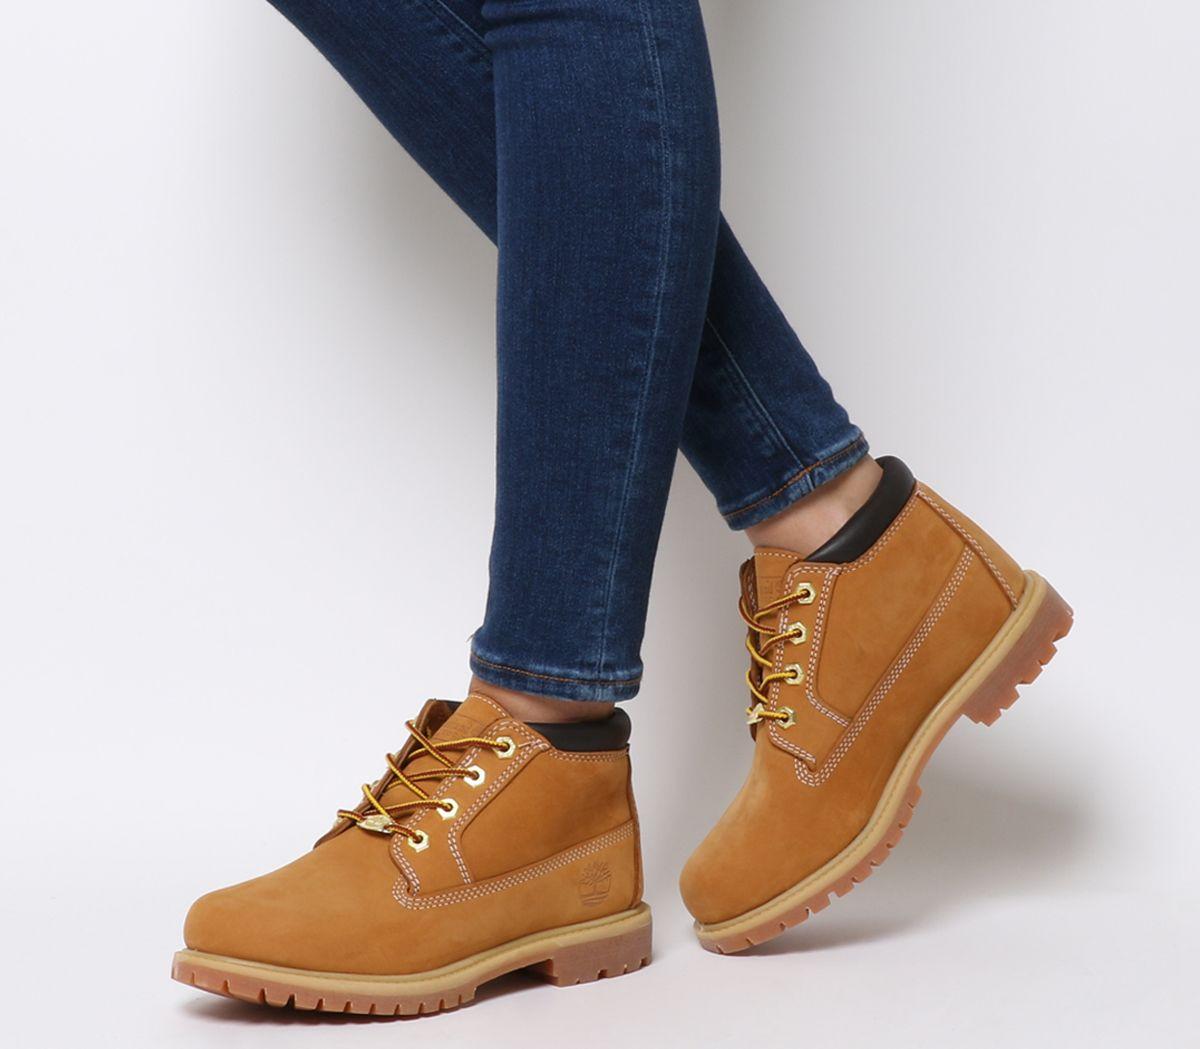 9504f03d17d7 Timberland Nellie Chukka Double Waterproof Boots Wheat Nubuck ...